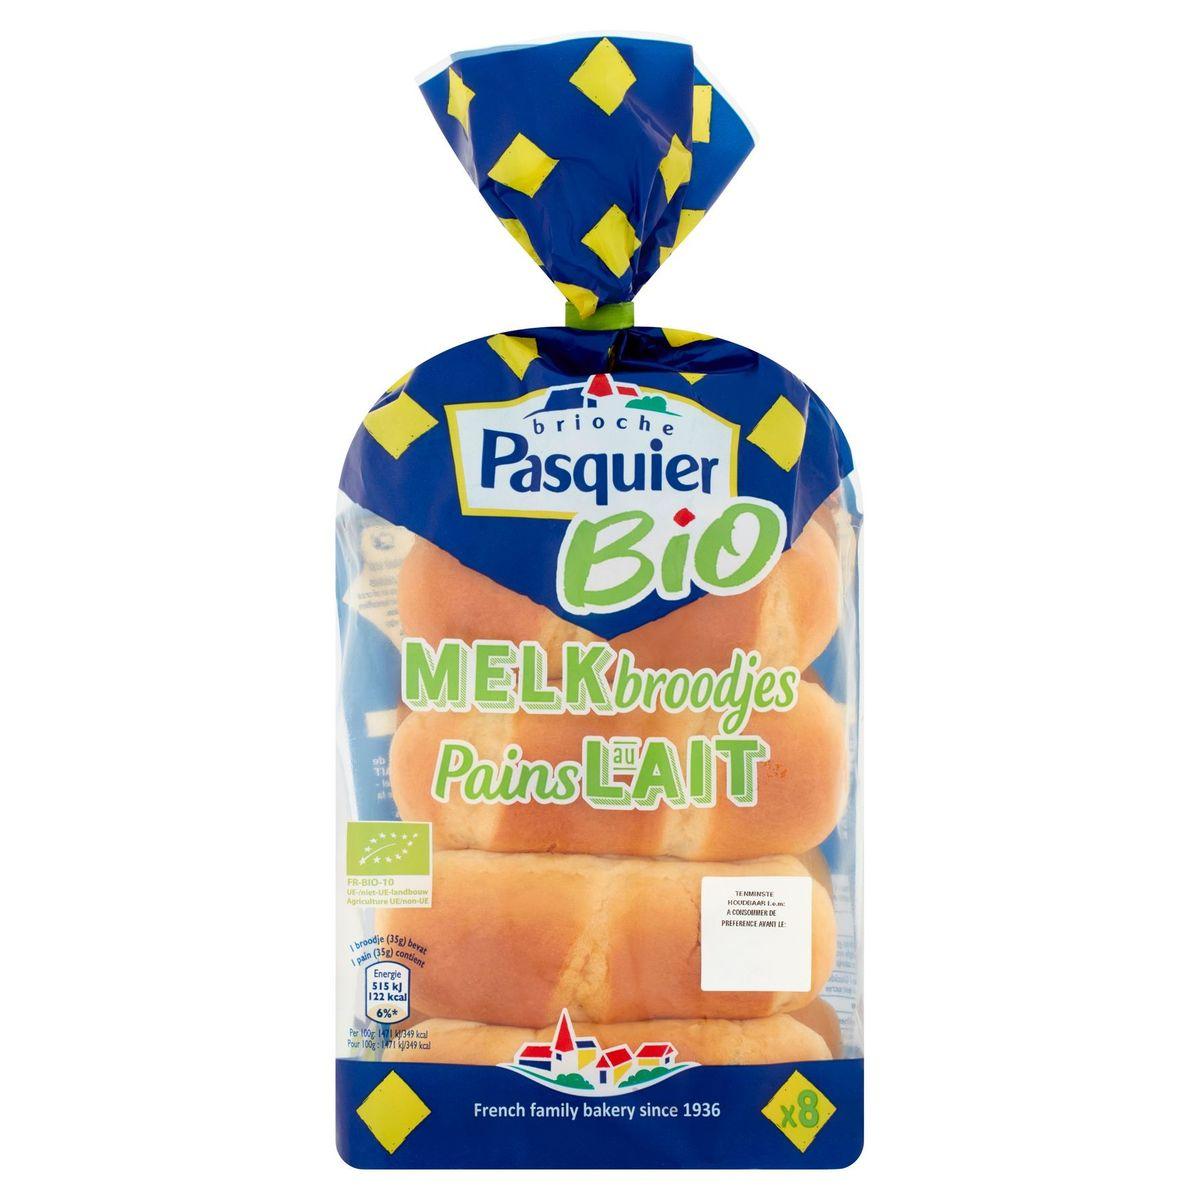 Brioche Pasquier Bio Melkbroodjes 8 x 35 g